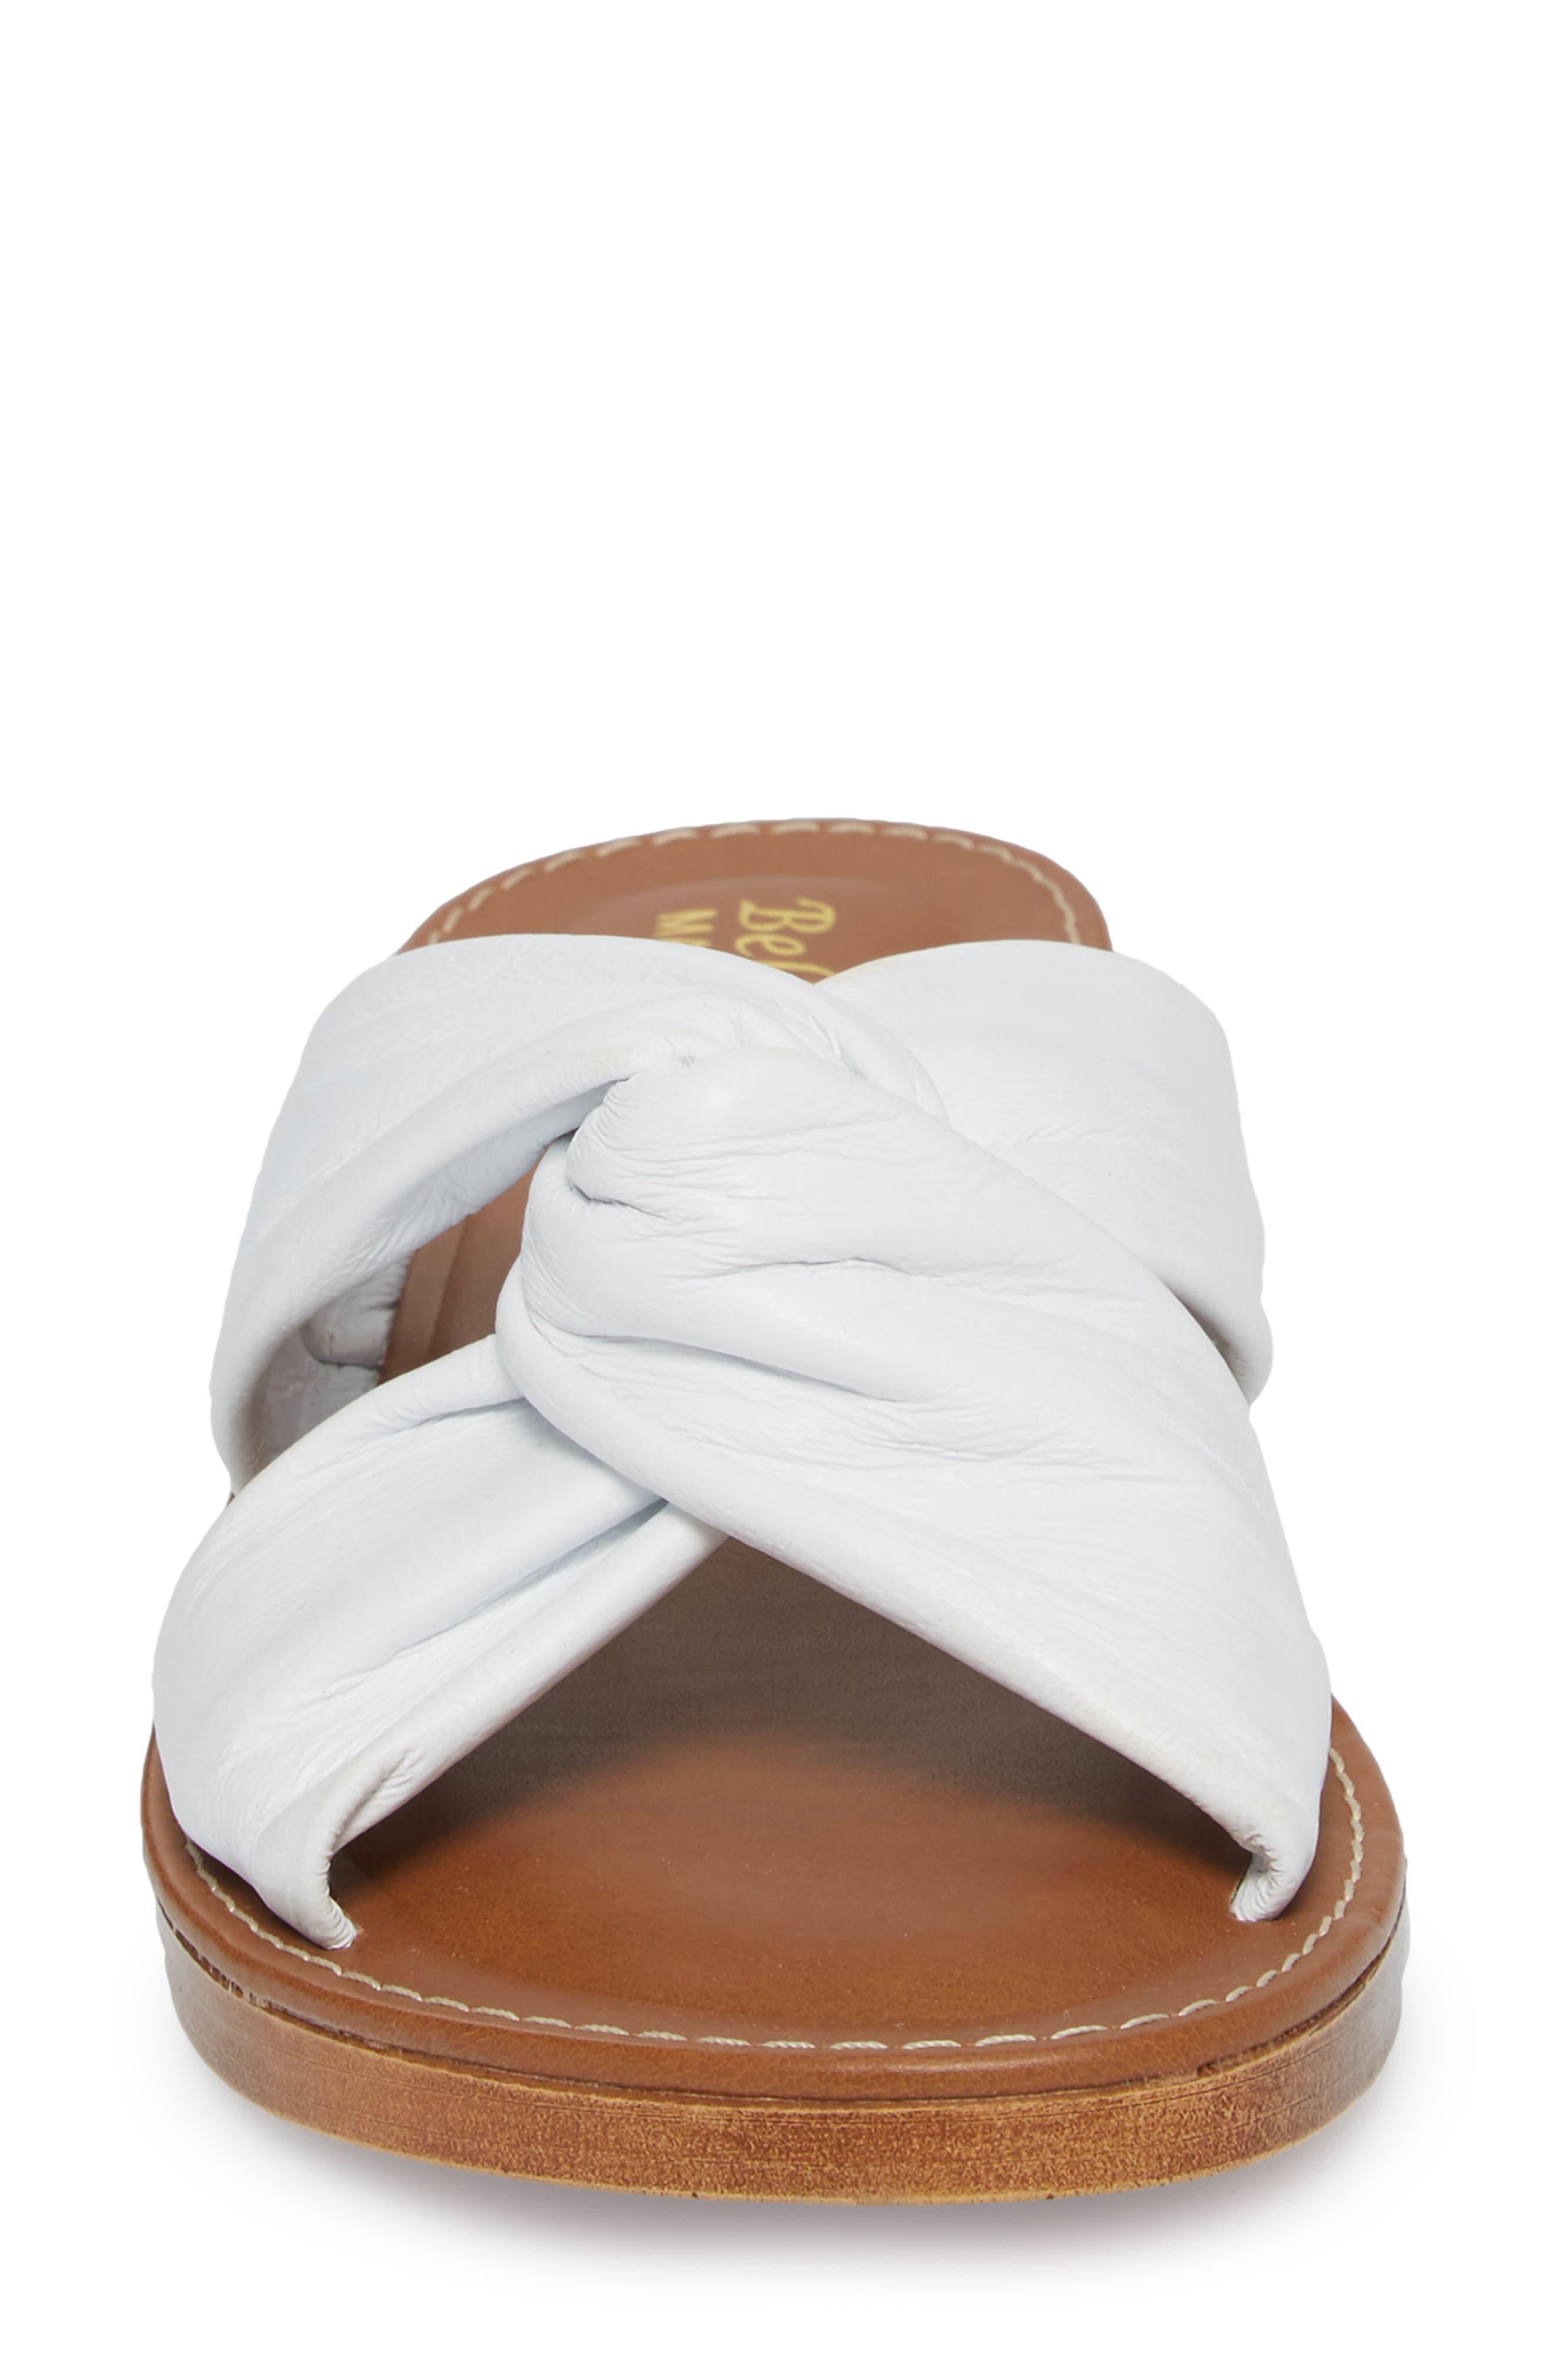 Noa Slide Sandal,                             Alternate thumbnail 4, color,                             White Leather